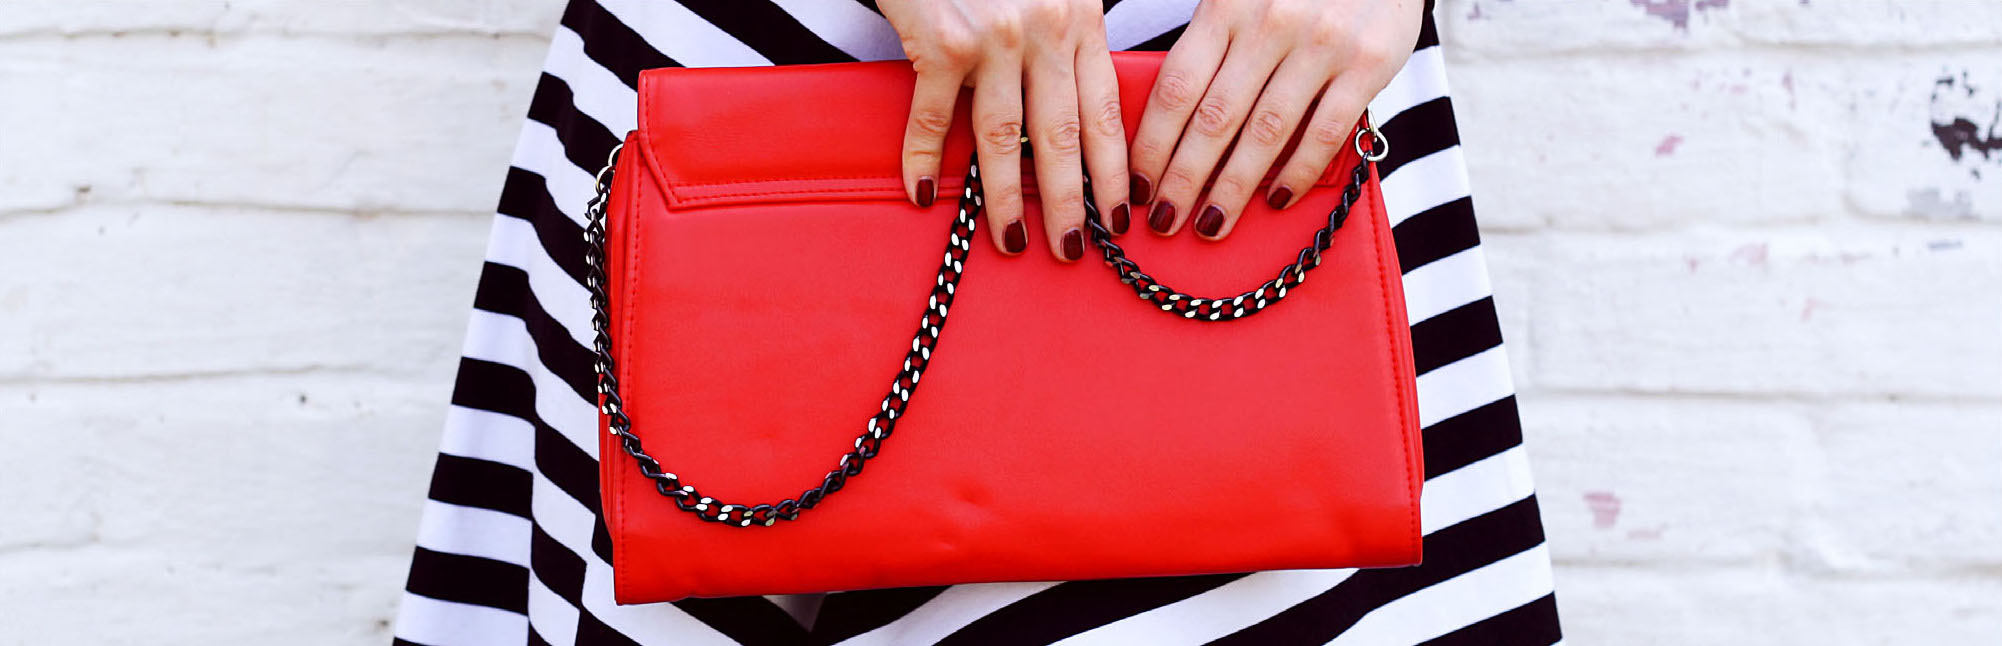 wmis_handbag_header